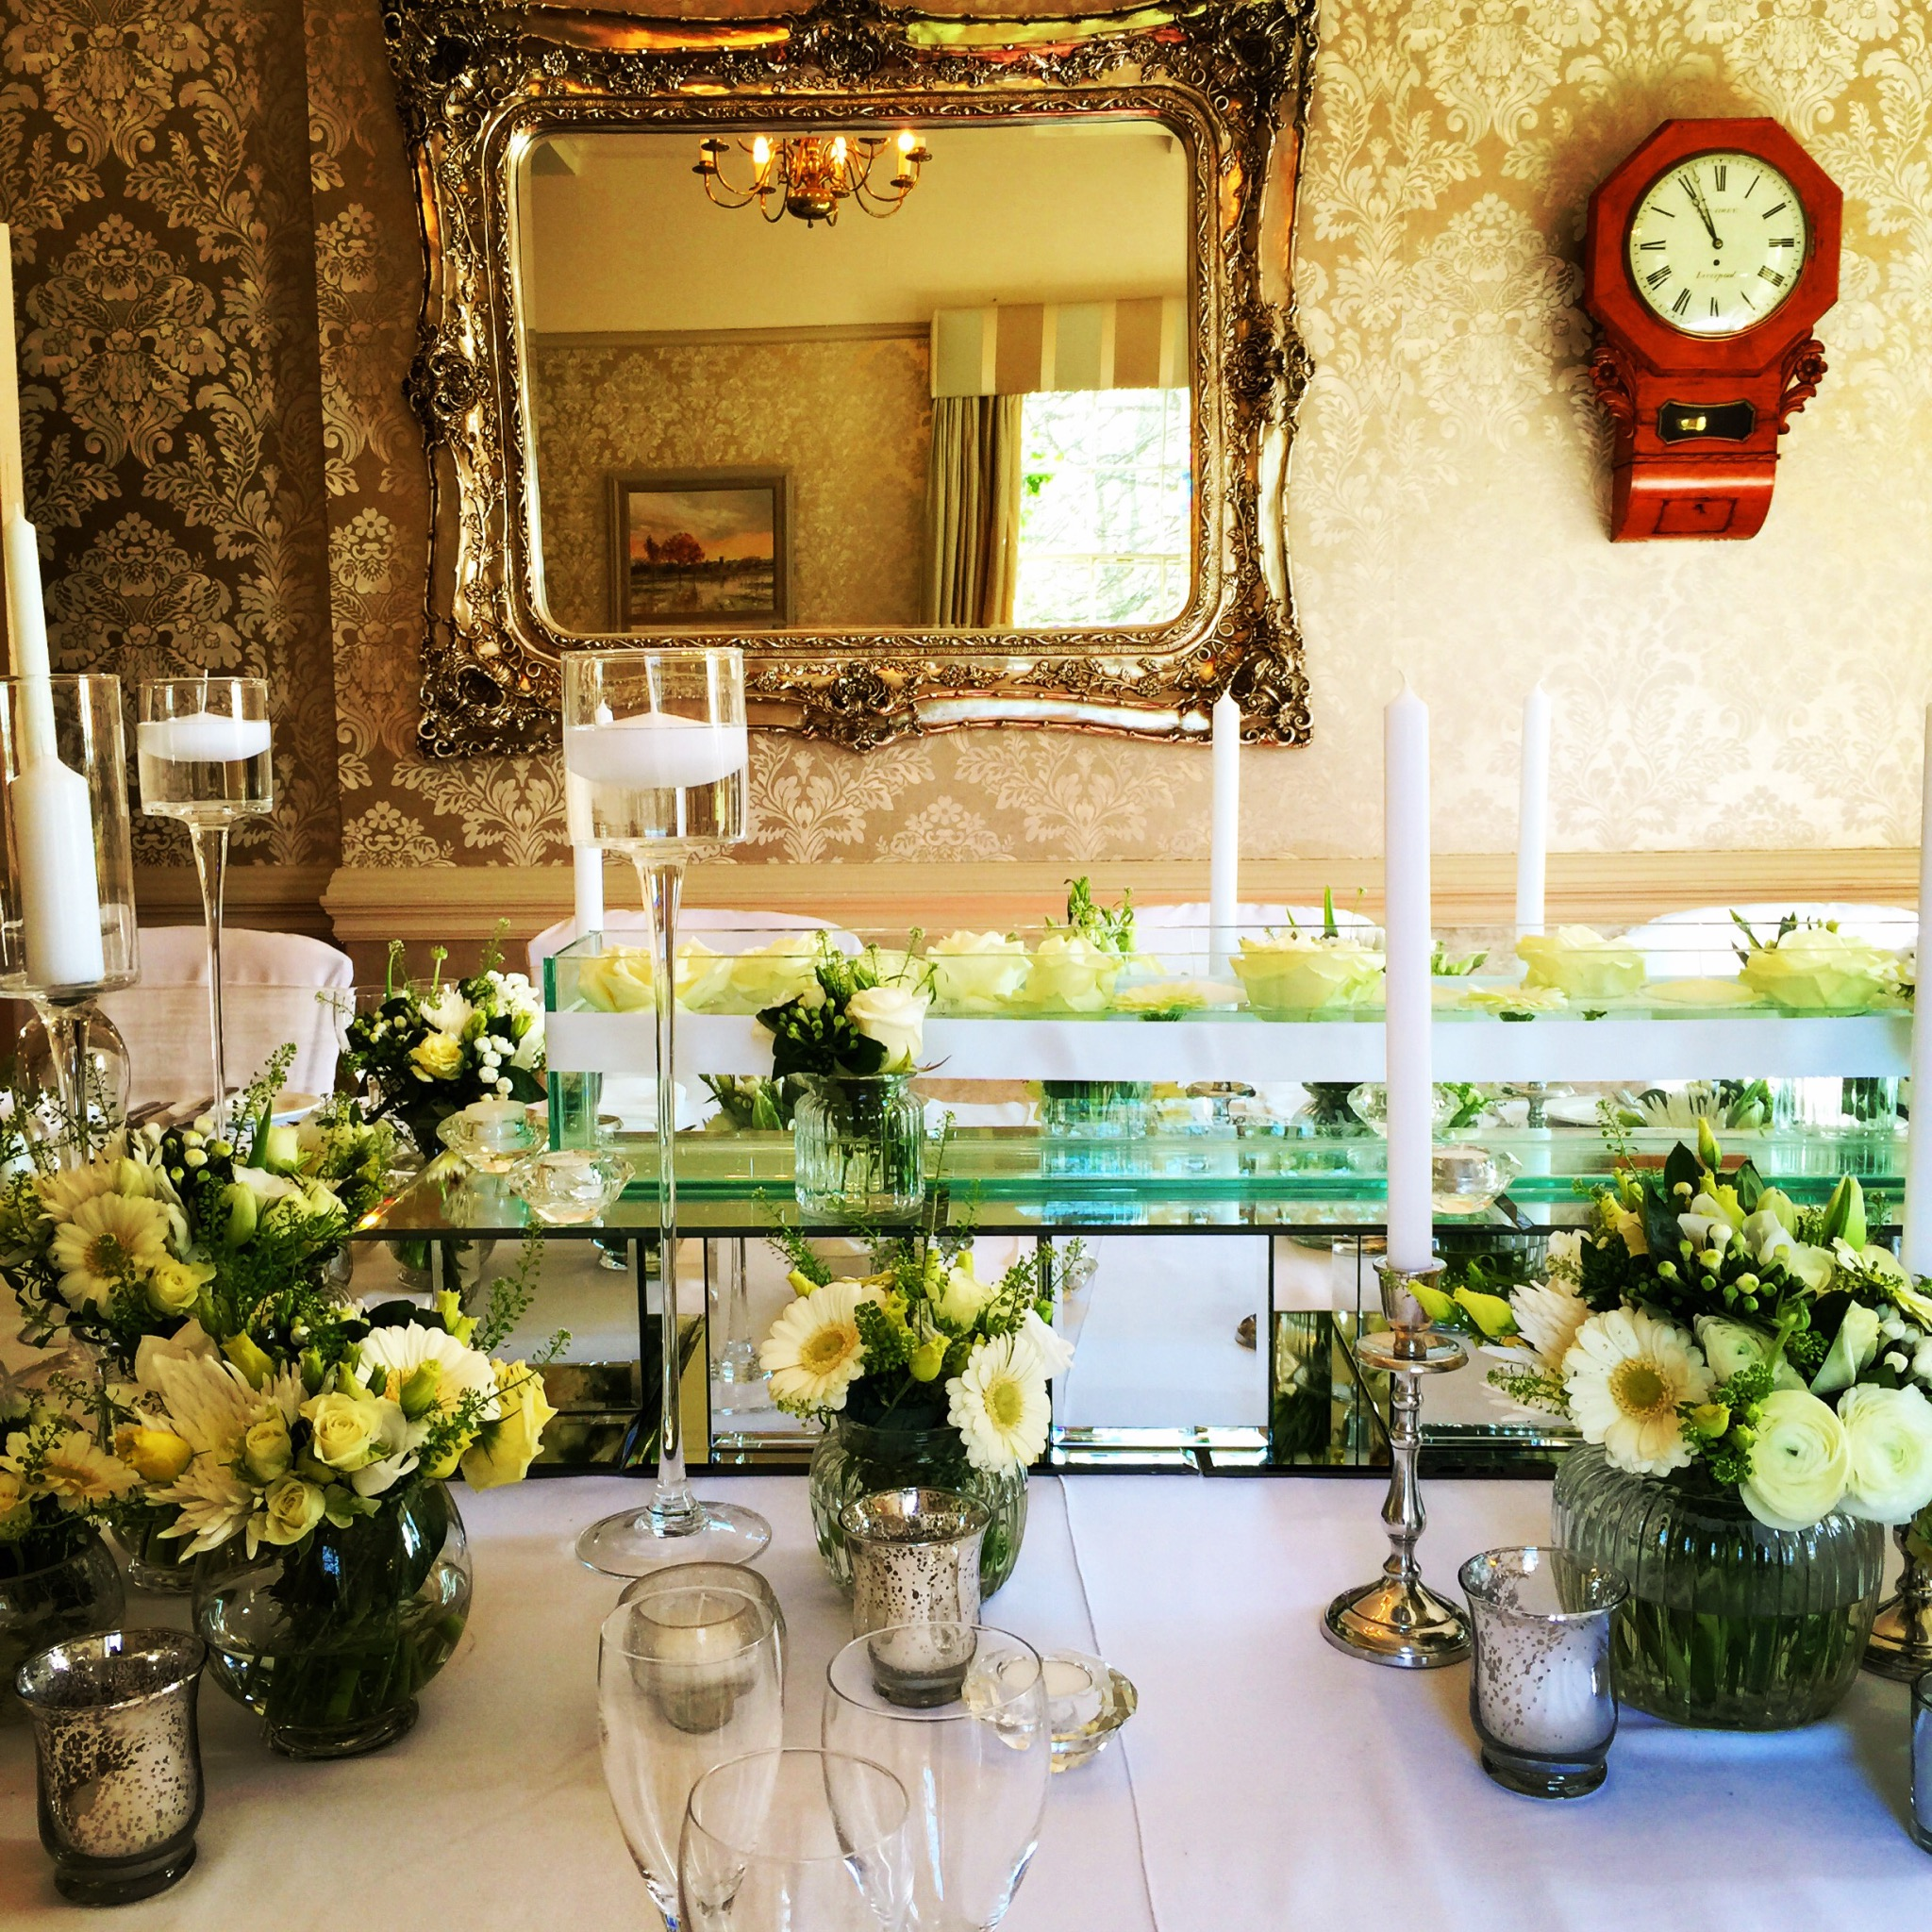 TJ Designer Weddings - Mulberry House (2)